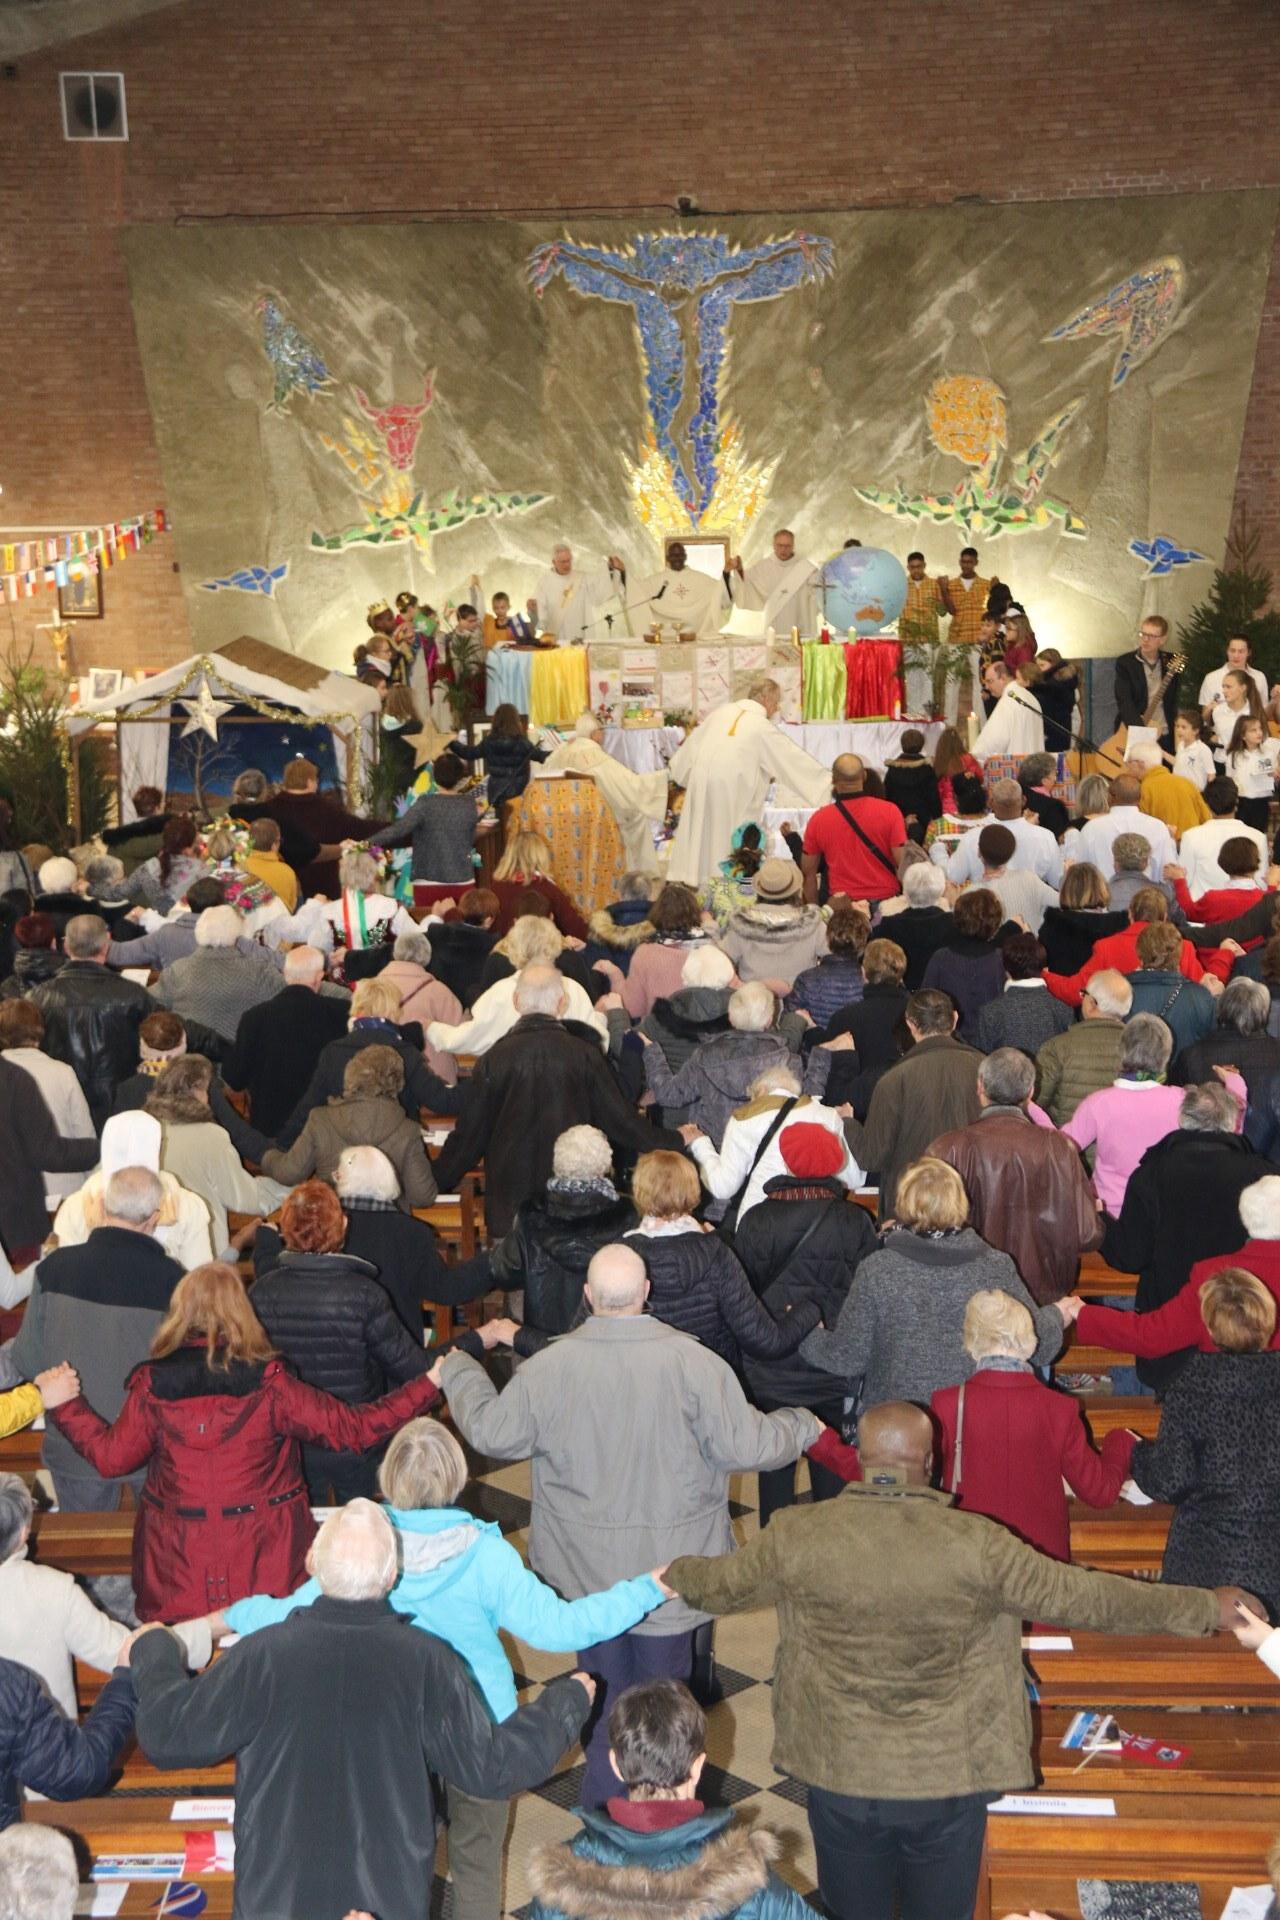 Messe des Nations 79